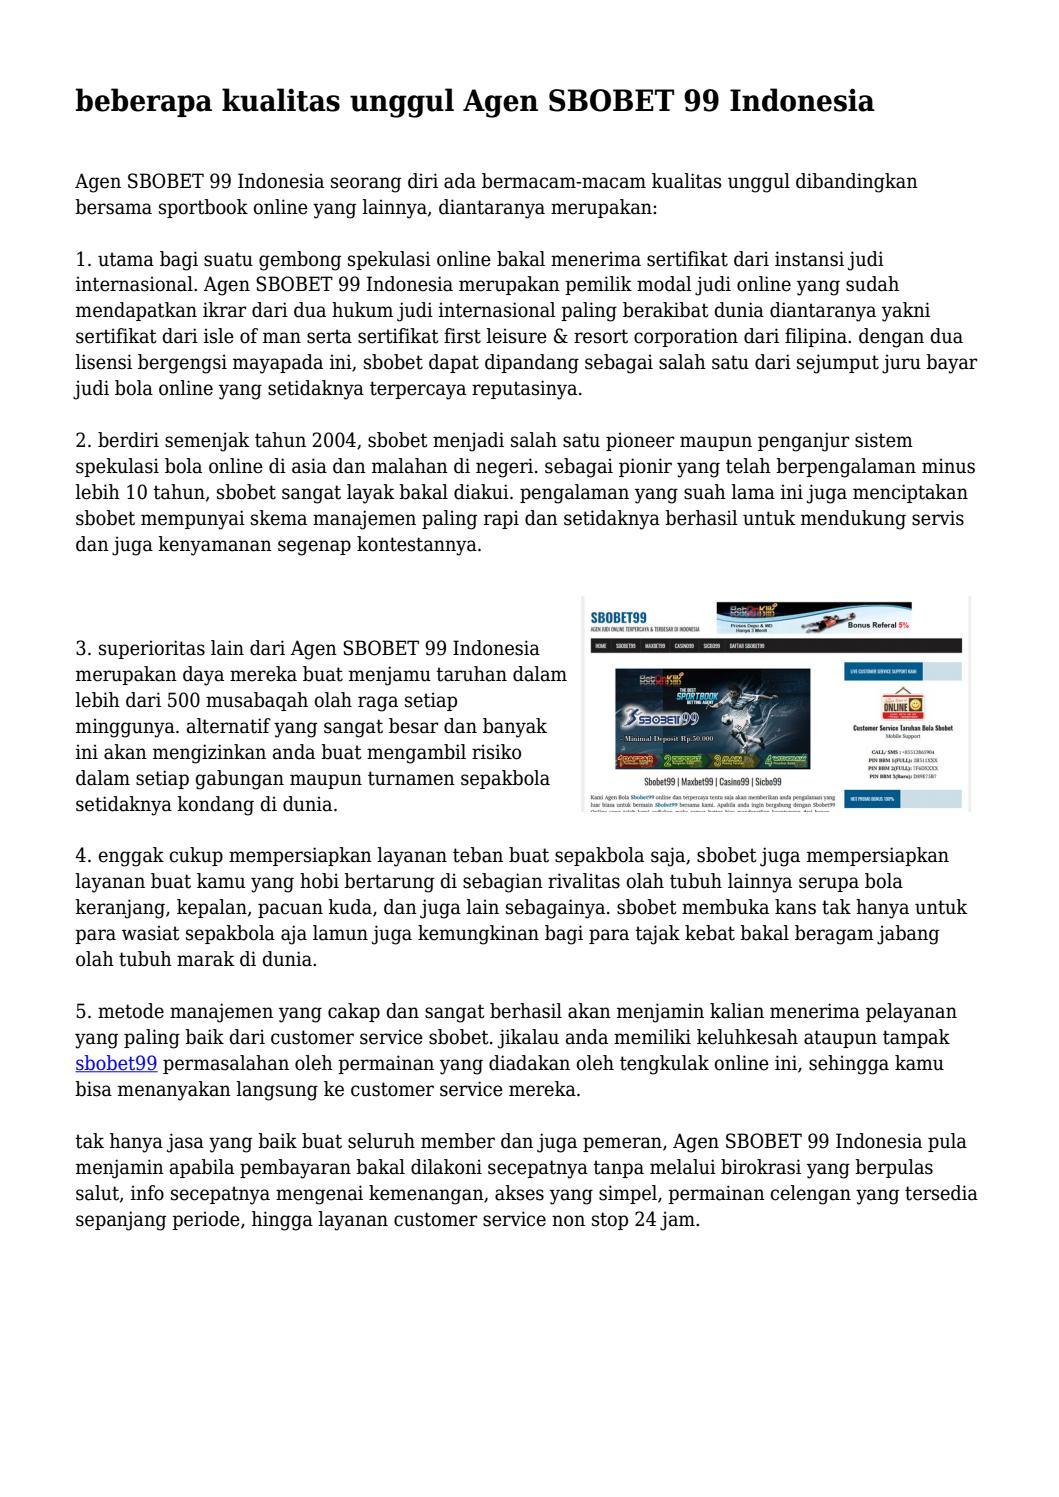 Beberapa Kualitas Unggul Agen Sbobet 99 Indonesia By Industrioushate7 Issuu